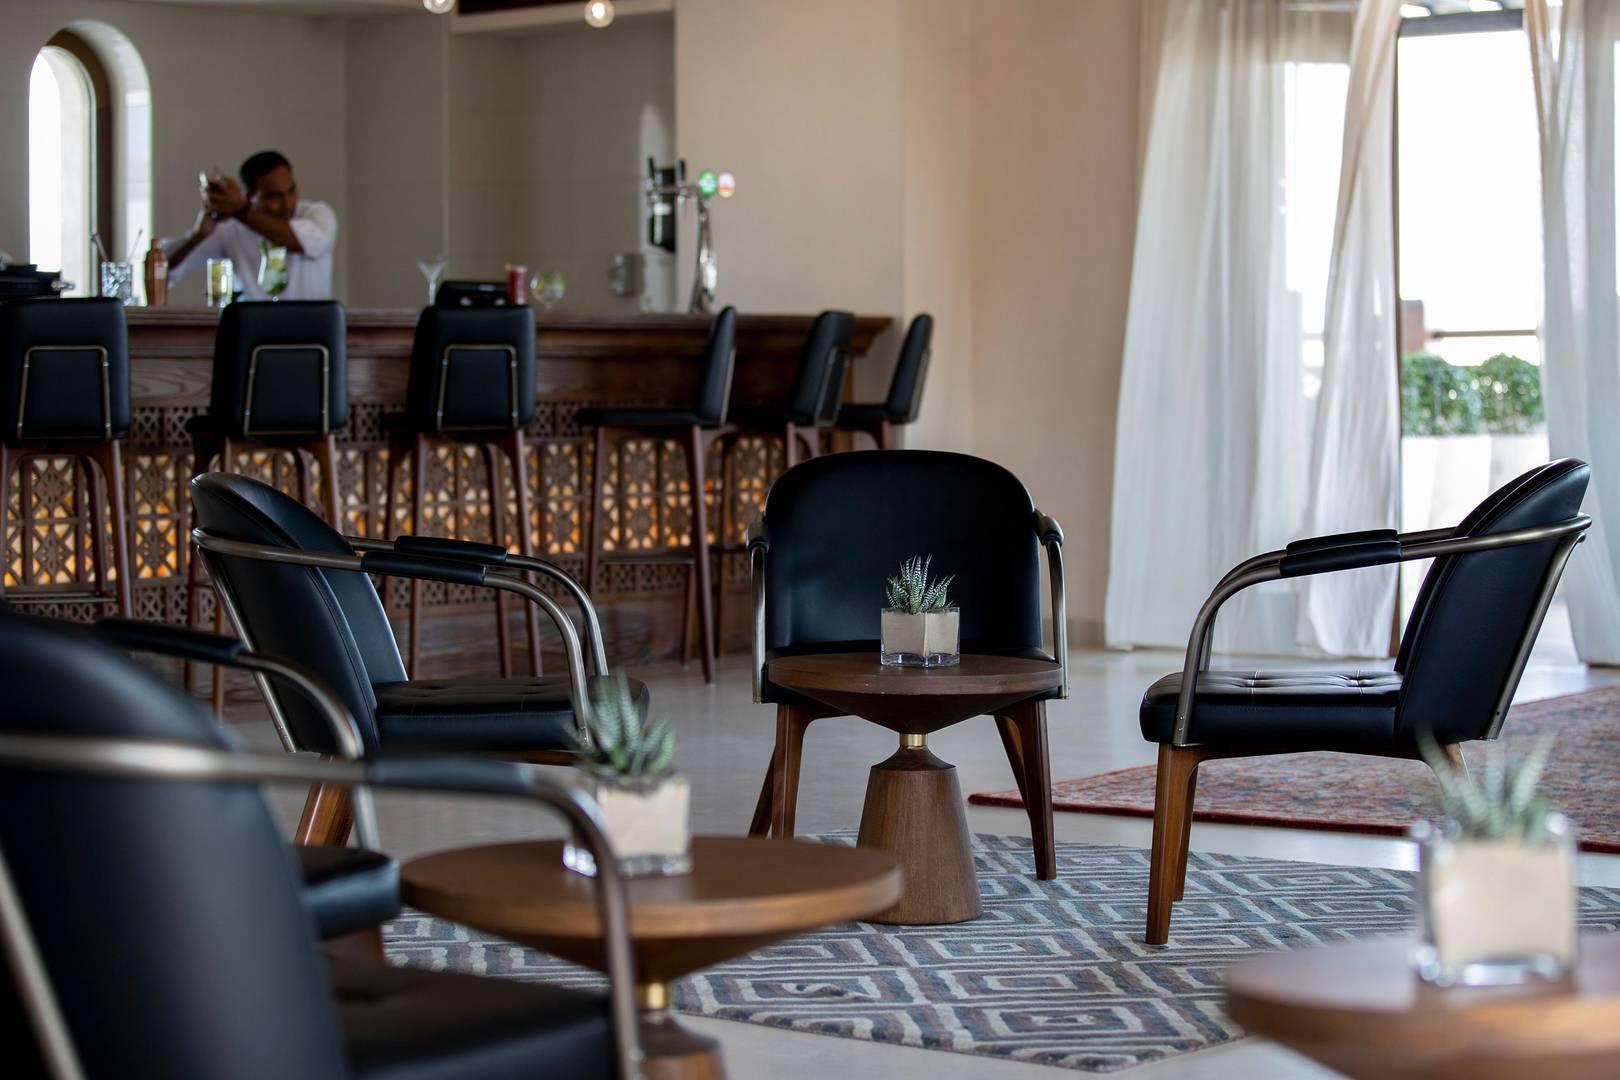 https://cdn.jumeirah.com/-/mediadh/DH/Hospitality/Jumeirah/Restaurants/Abu-Dhabi/Al-Wathba-El-Mesayan/Restaurant-Gallery/High_resolution_300dpi-Jumeirah-Al-Wathba_Restaurant_Al-Mesayan-13_6-4.jpg?h=1080&w=1620&hash=92B853B298C5D6D3477BA420DDF7A158